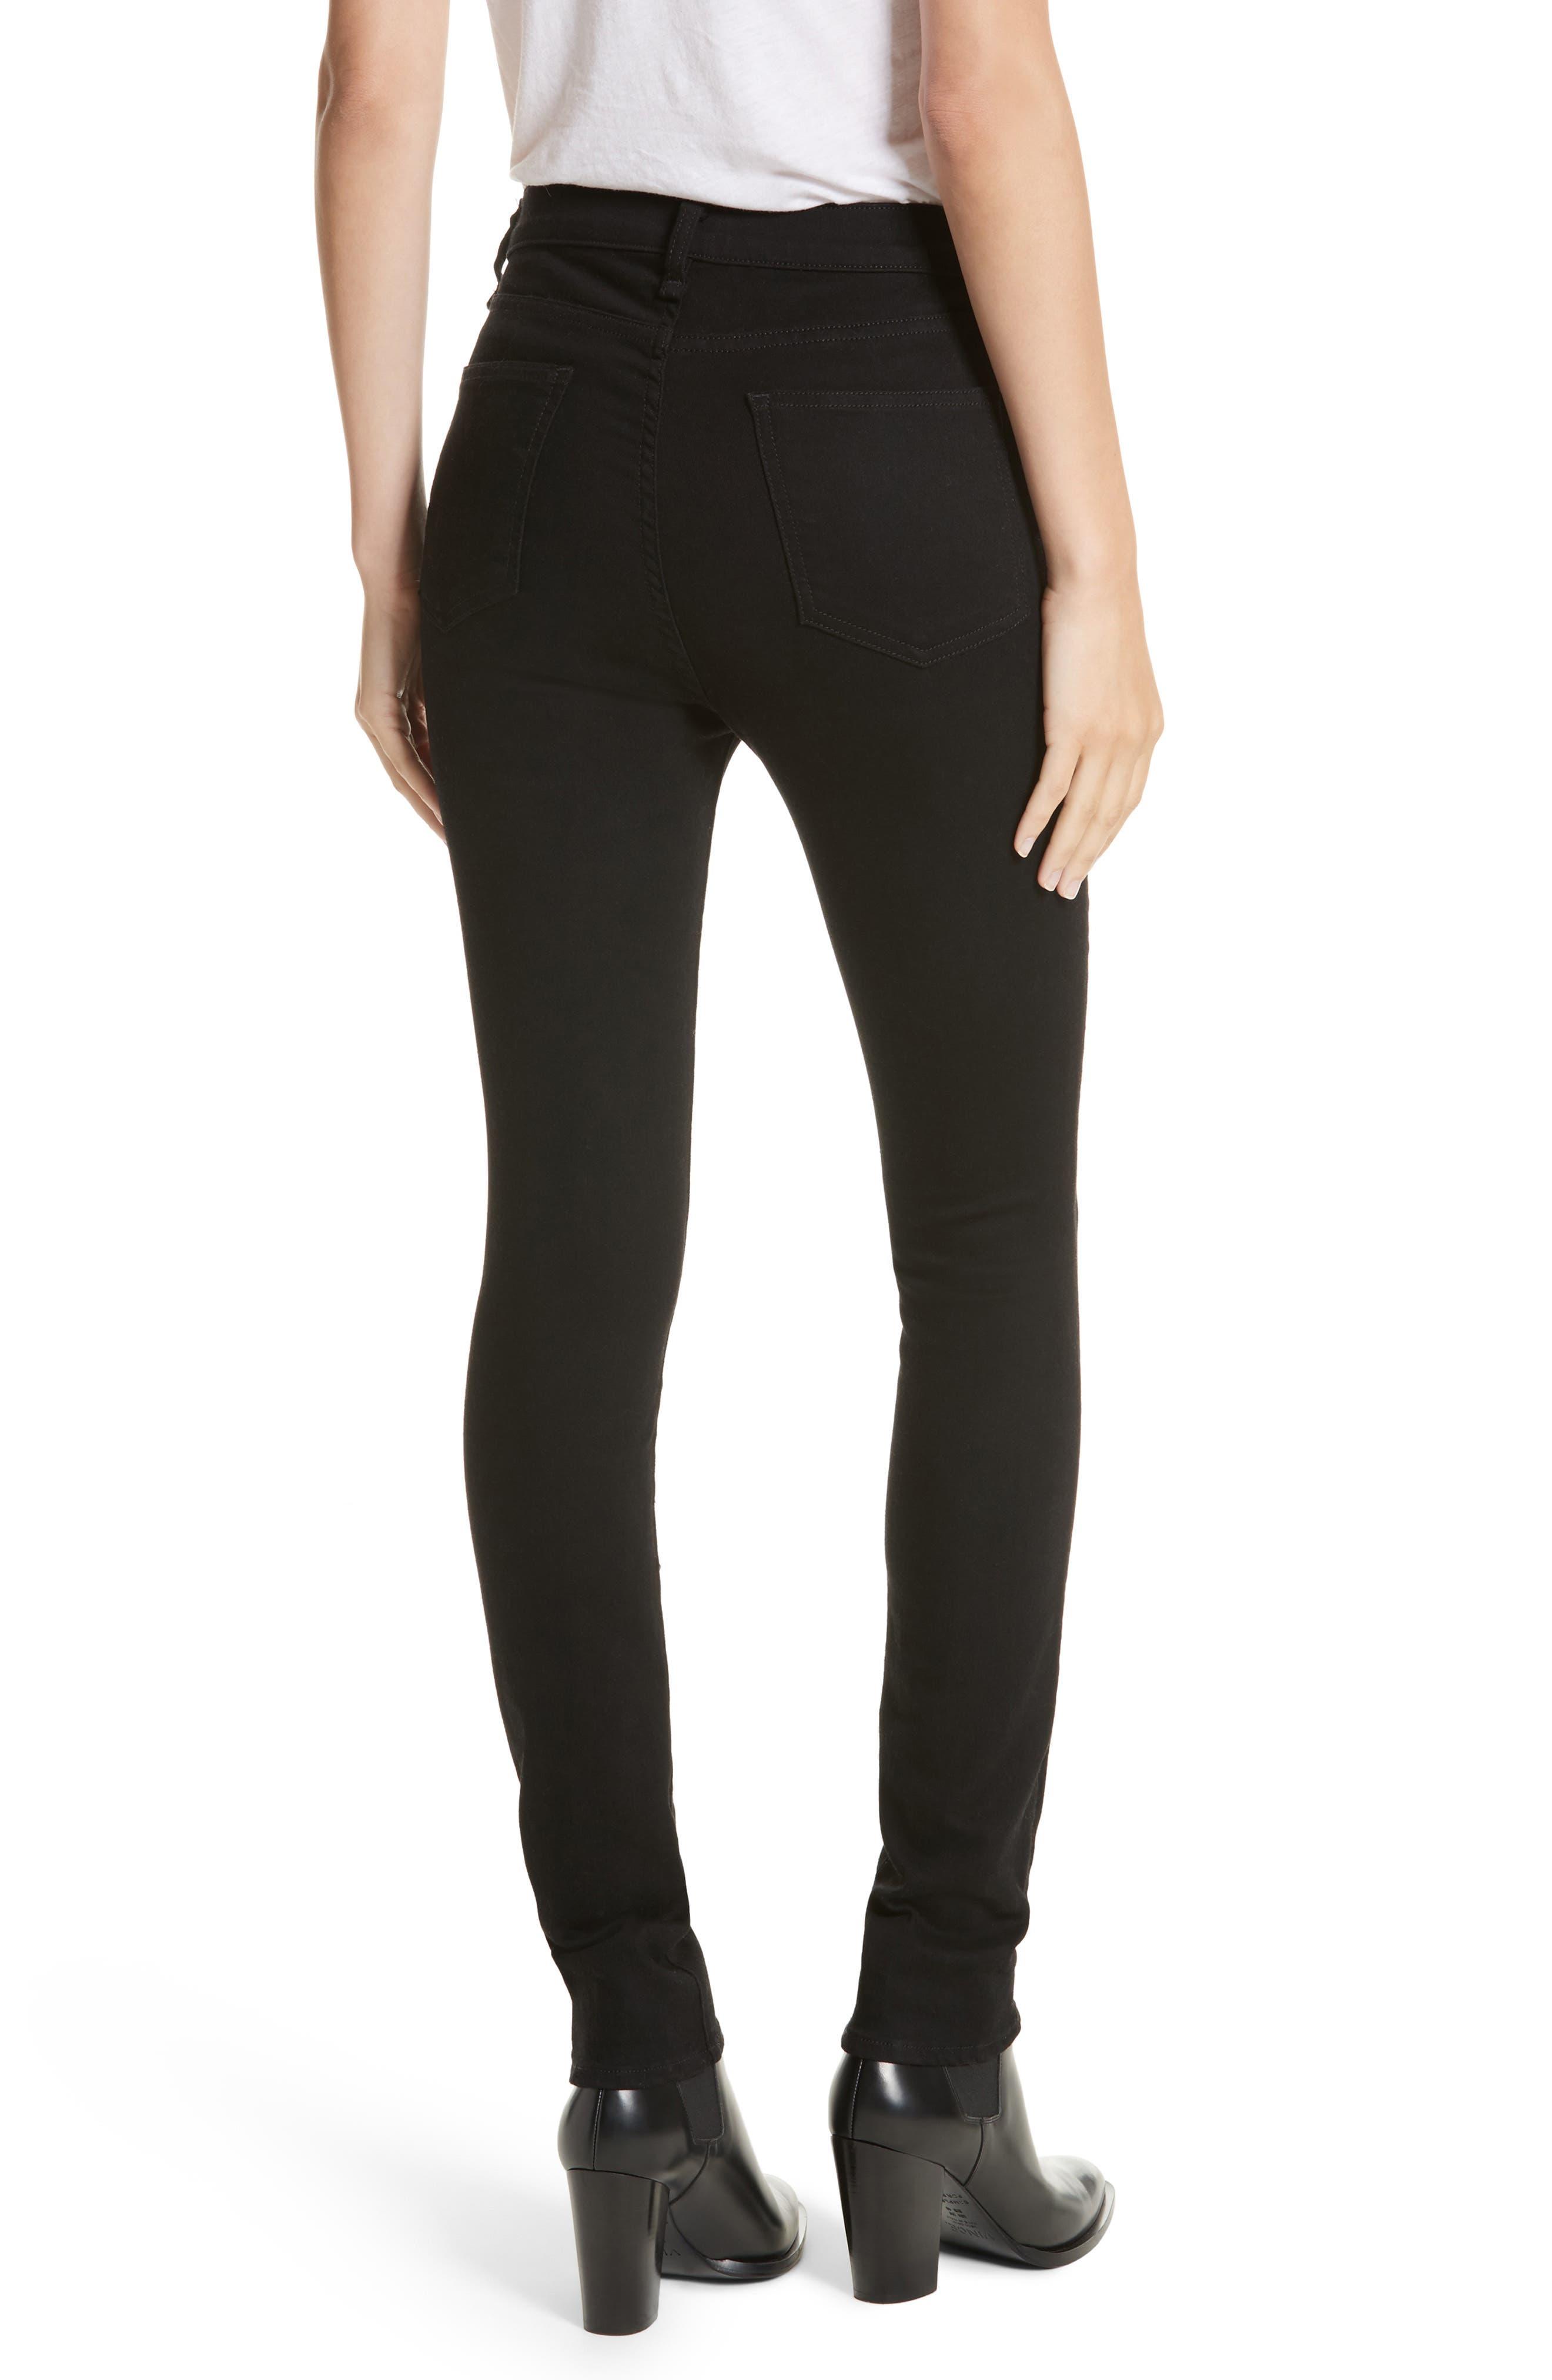 Kate 10 Skinny Jeans,                             Alternate thumbnail 2, color,                             RAVEN